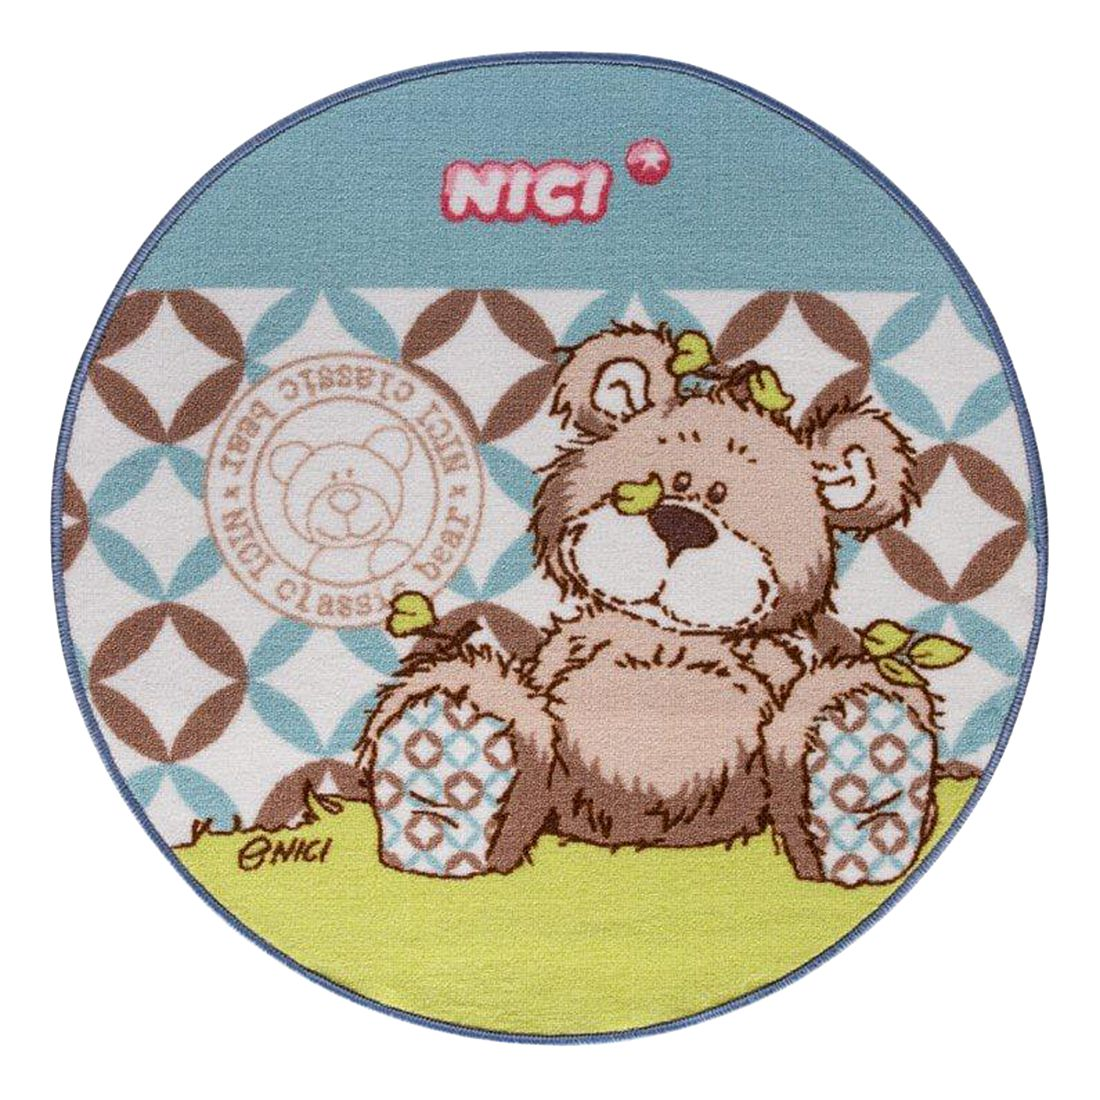 Teppich Nici Classic Bear Rund - Grün / Blau - 100 x 100 cm, Nici